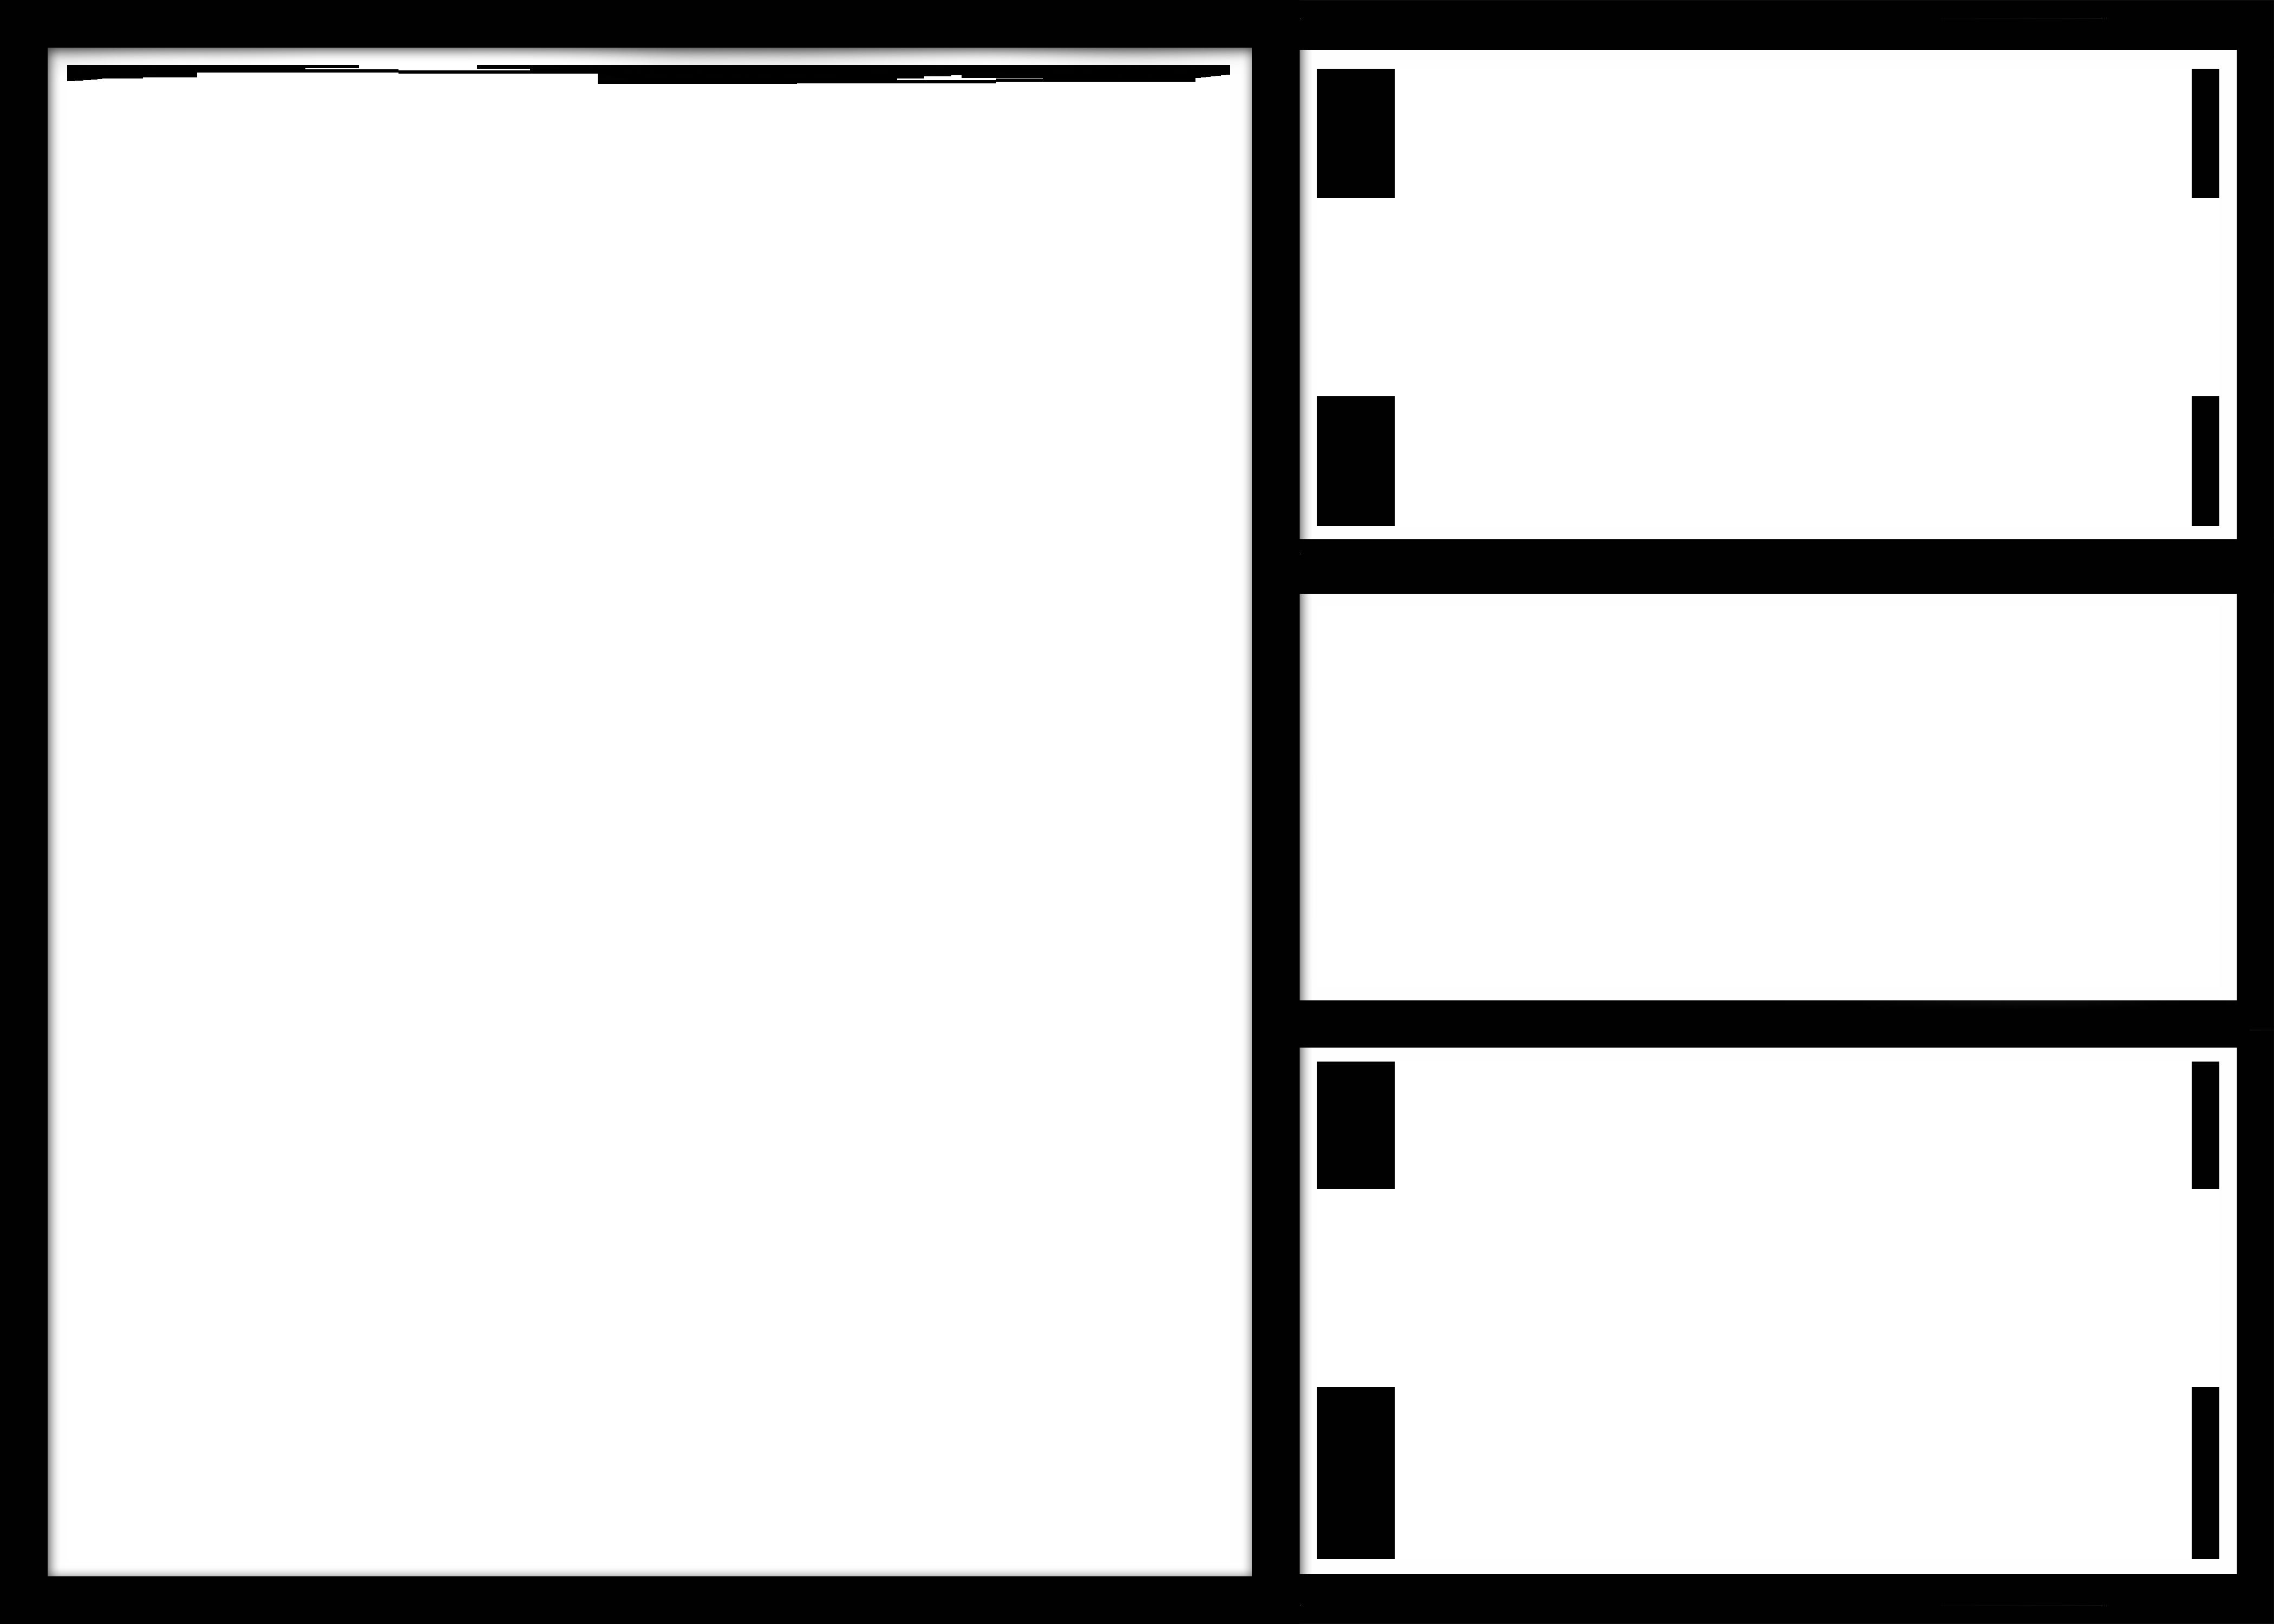 Multi Photo Frames Png Image